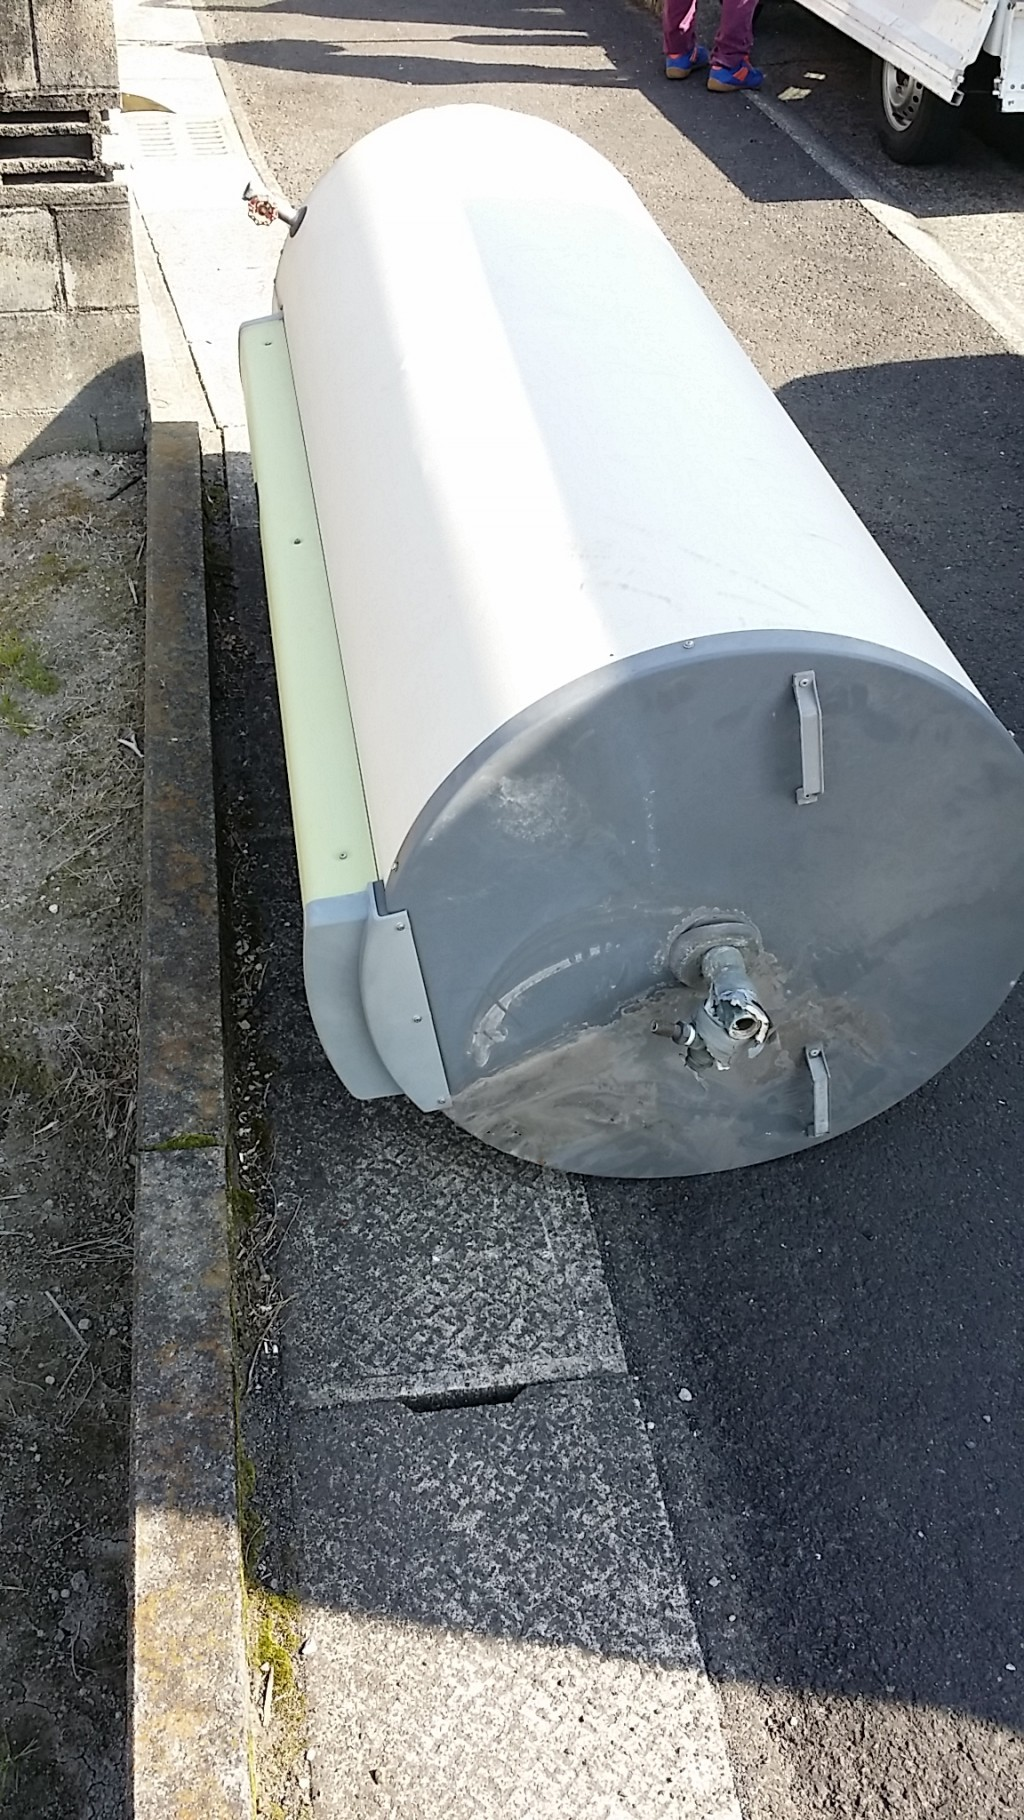 【阿久根市】電気温水器の不用品回収・処分ご依頼 お客様の声